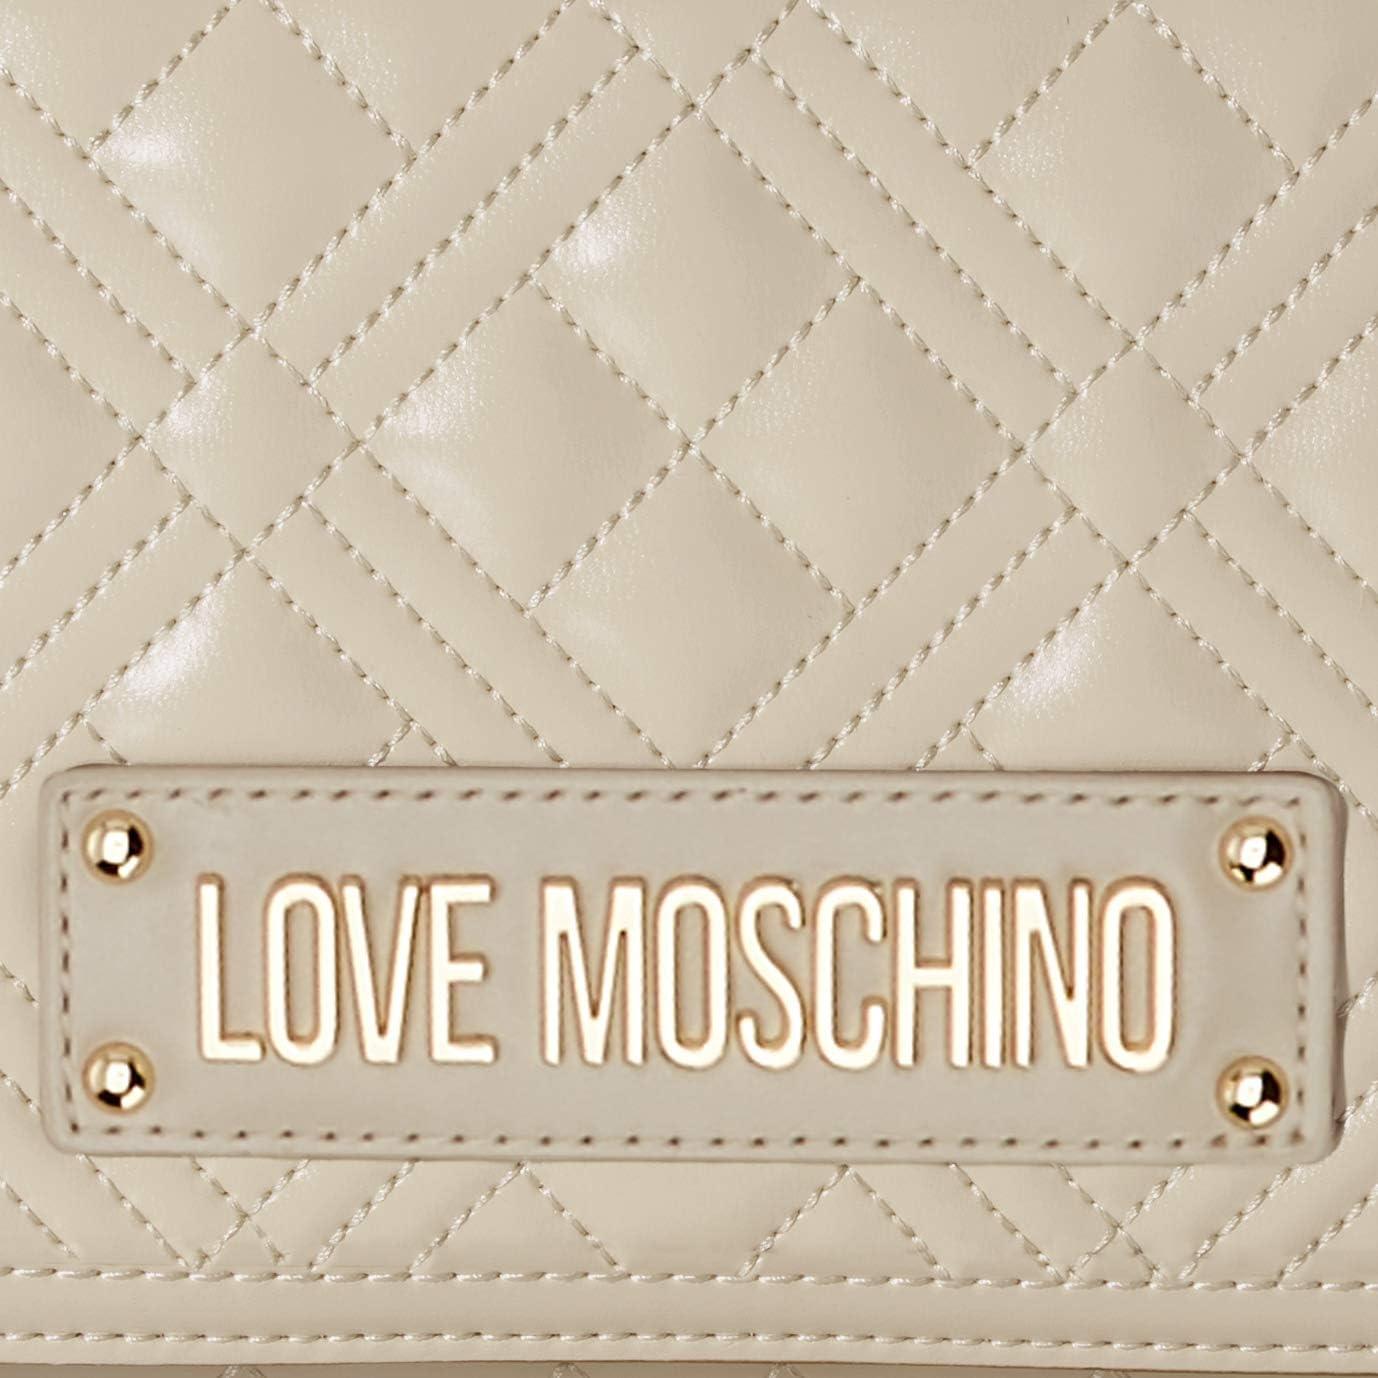 Love Moschino Jc4054pp1a, Sacs bandoulière Écru (Avorio)